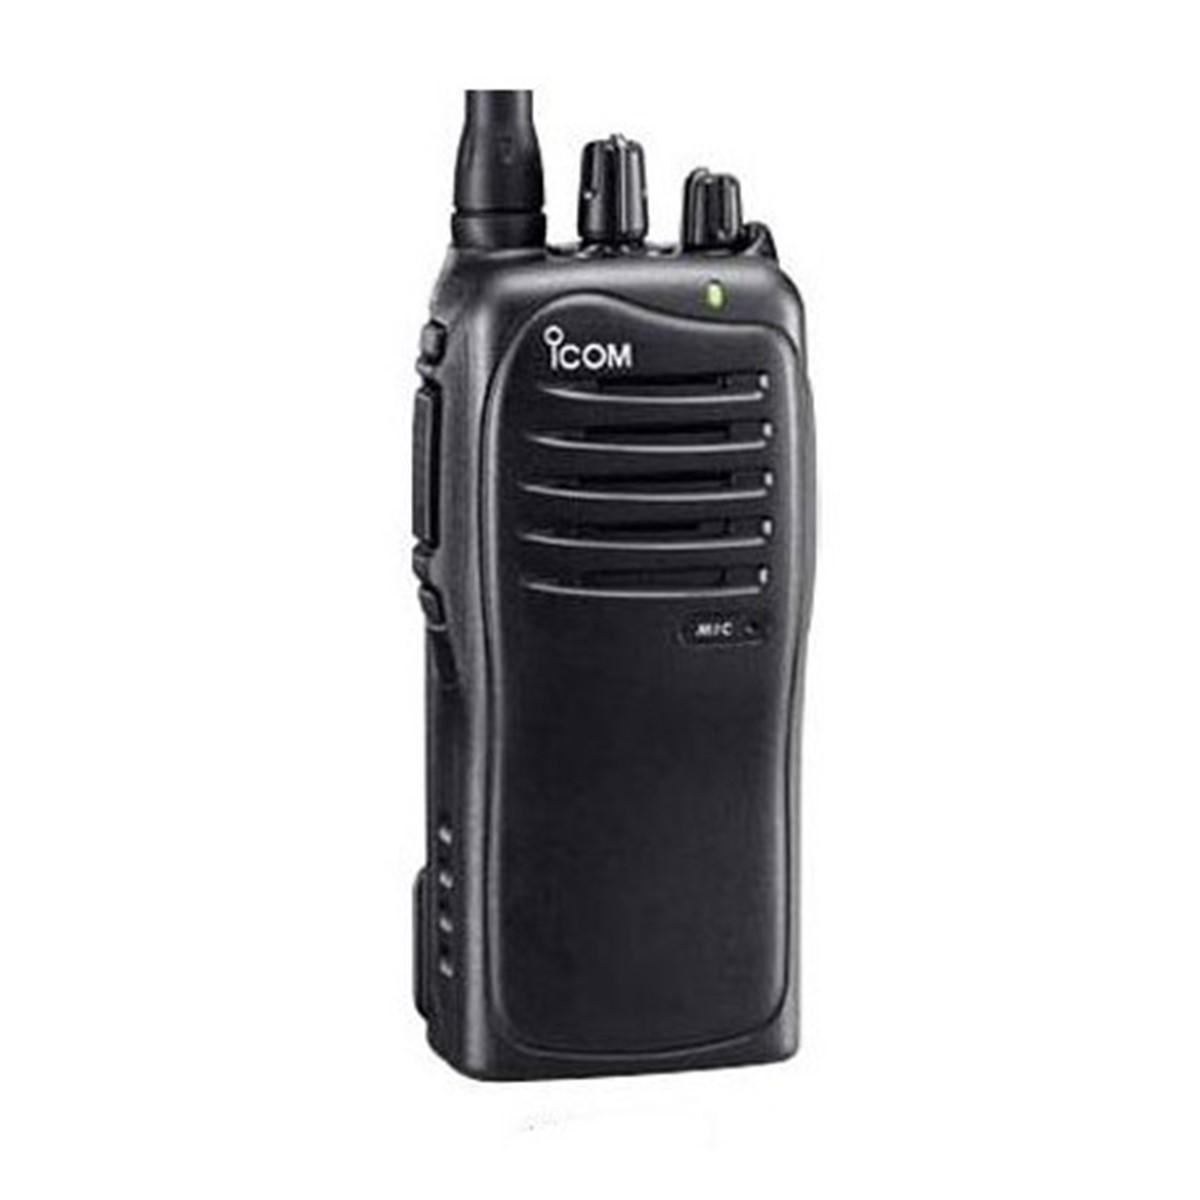 Radio Icom IC-F4013 Analógico UHF 450-512 MHz